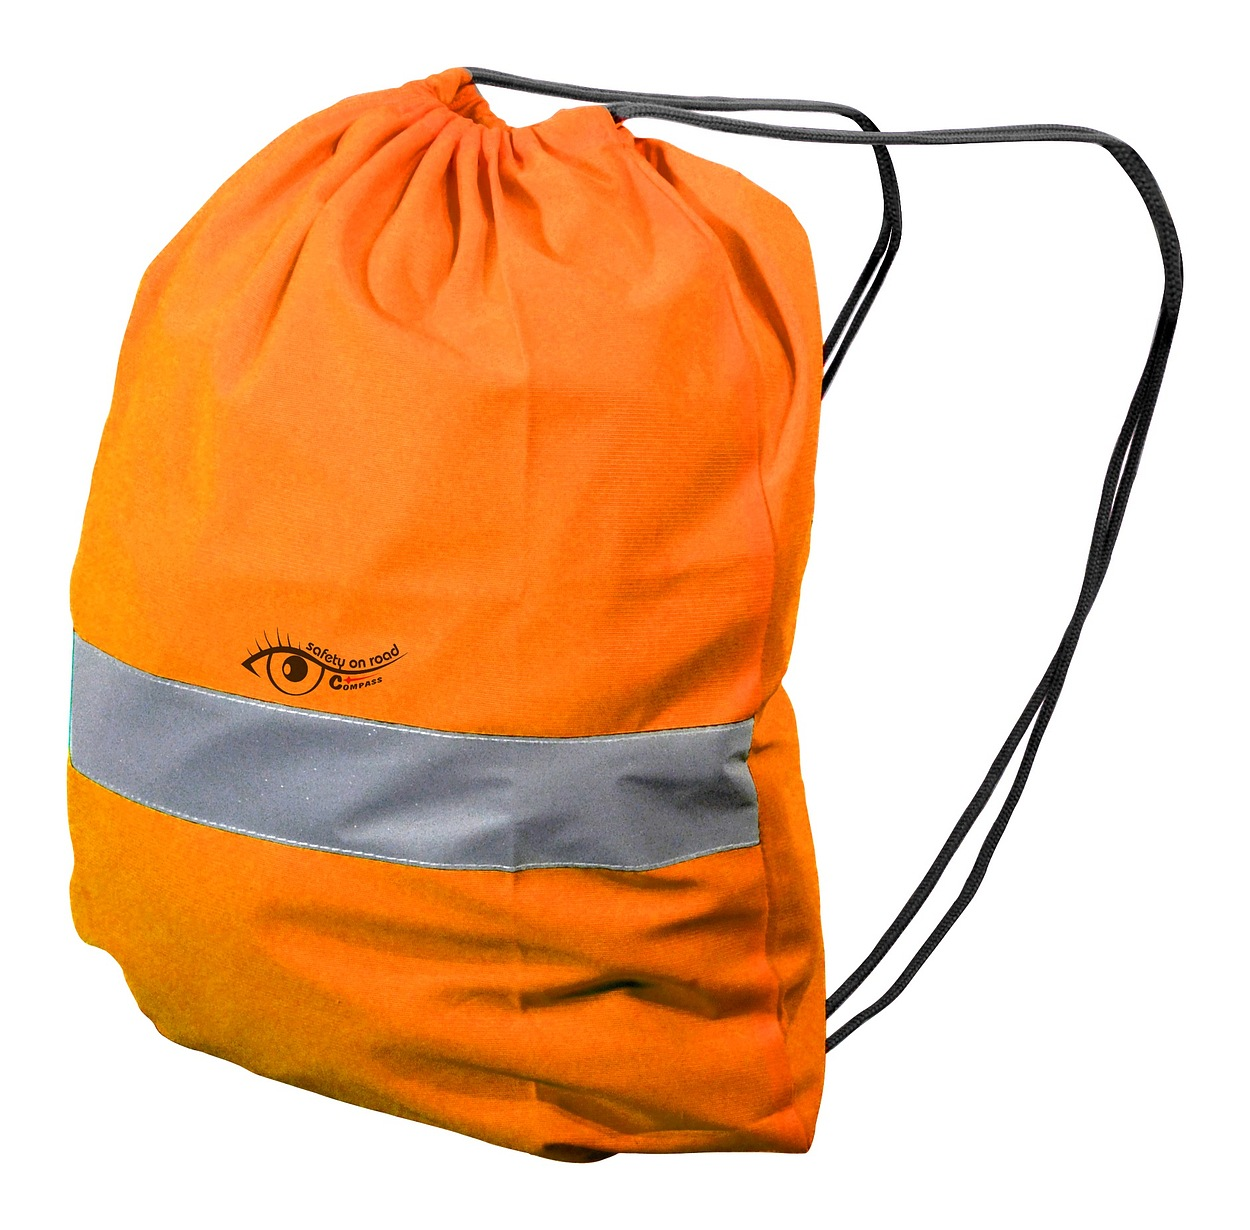 Compass Batoh reflexní S.O.R. oranžový